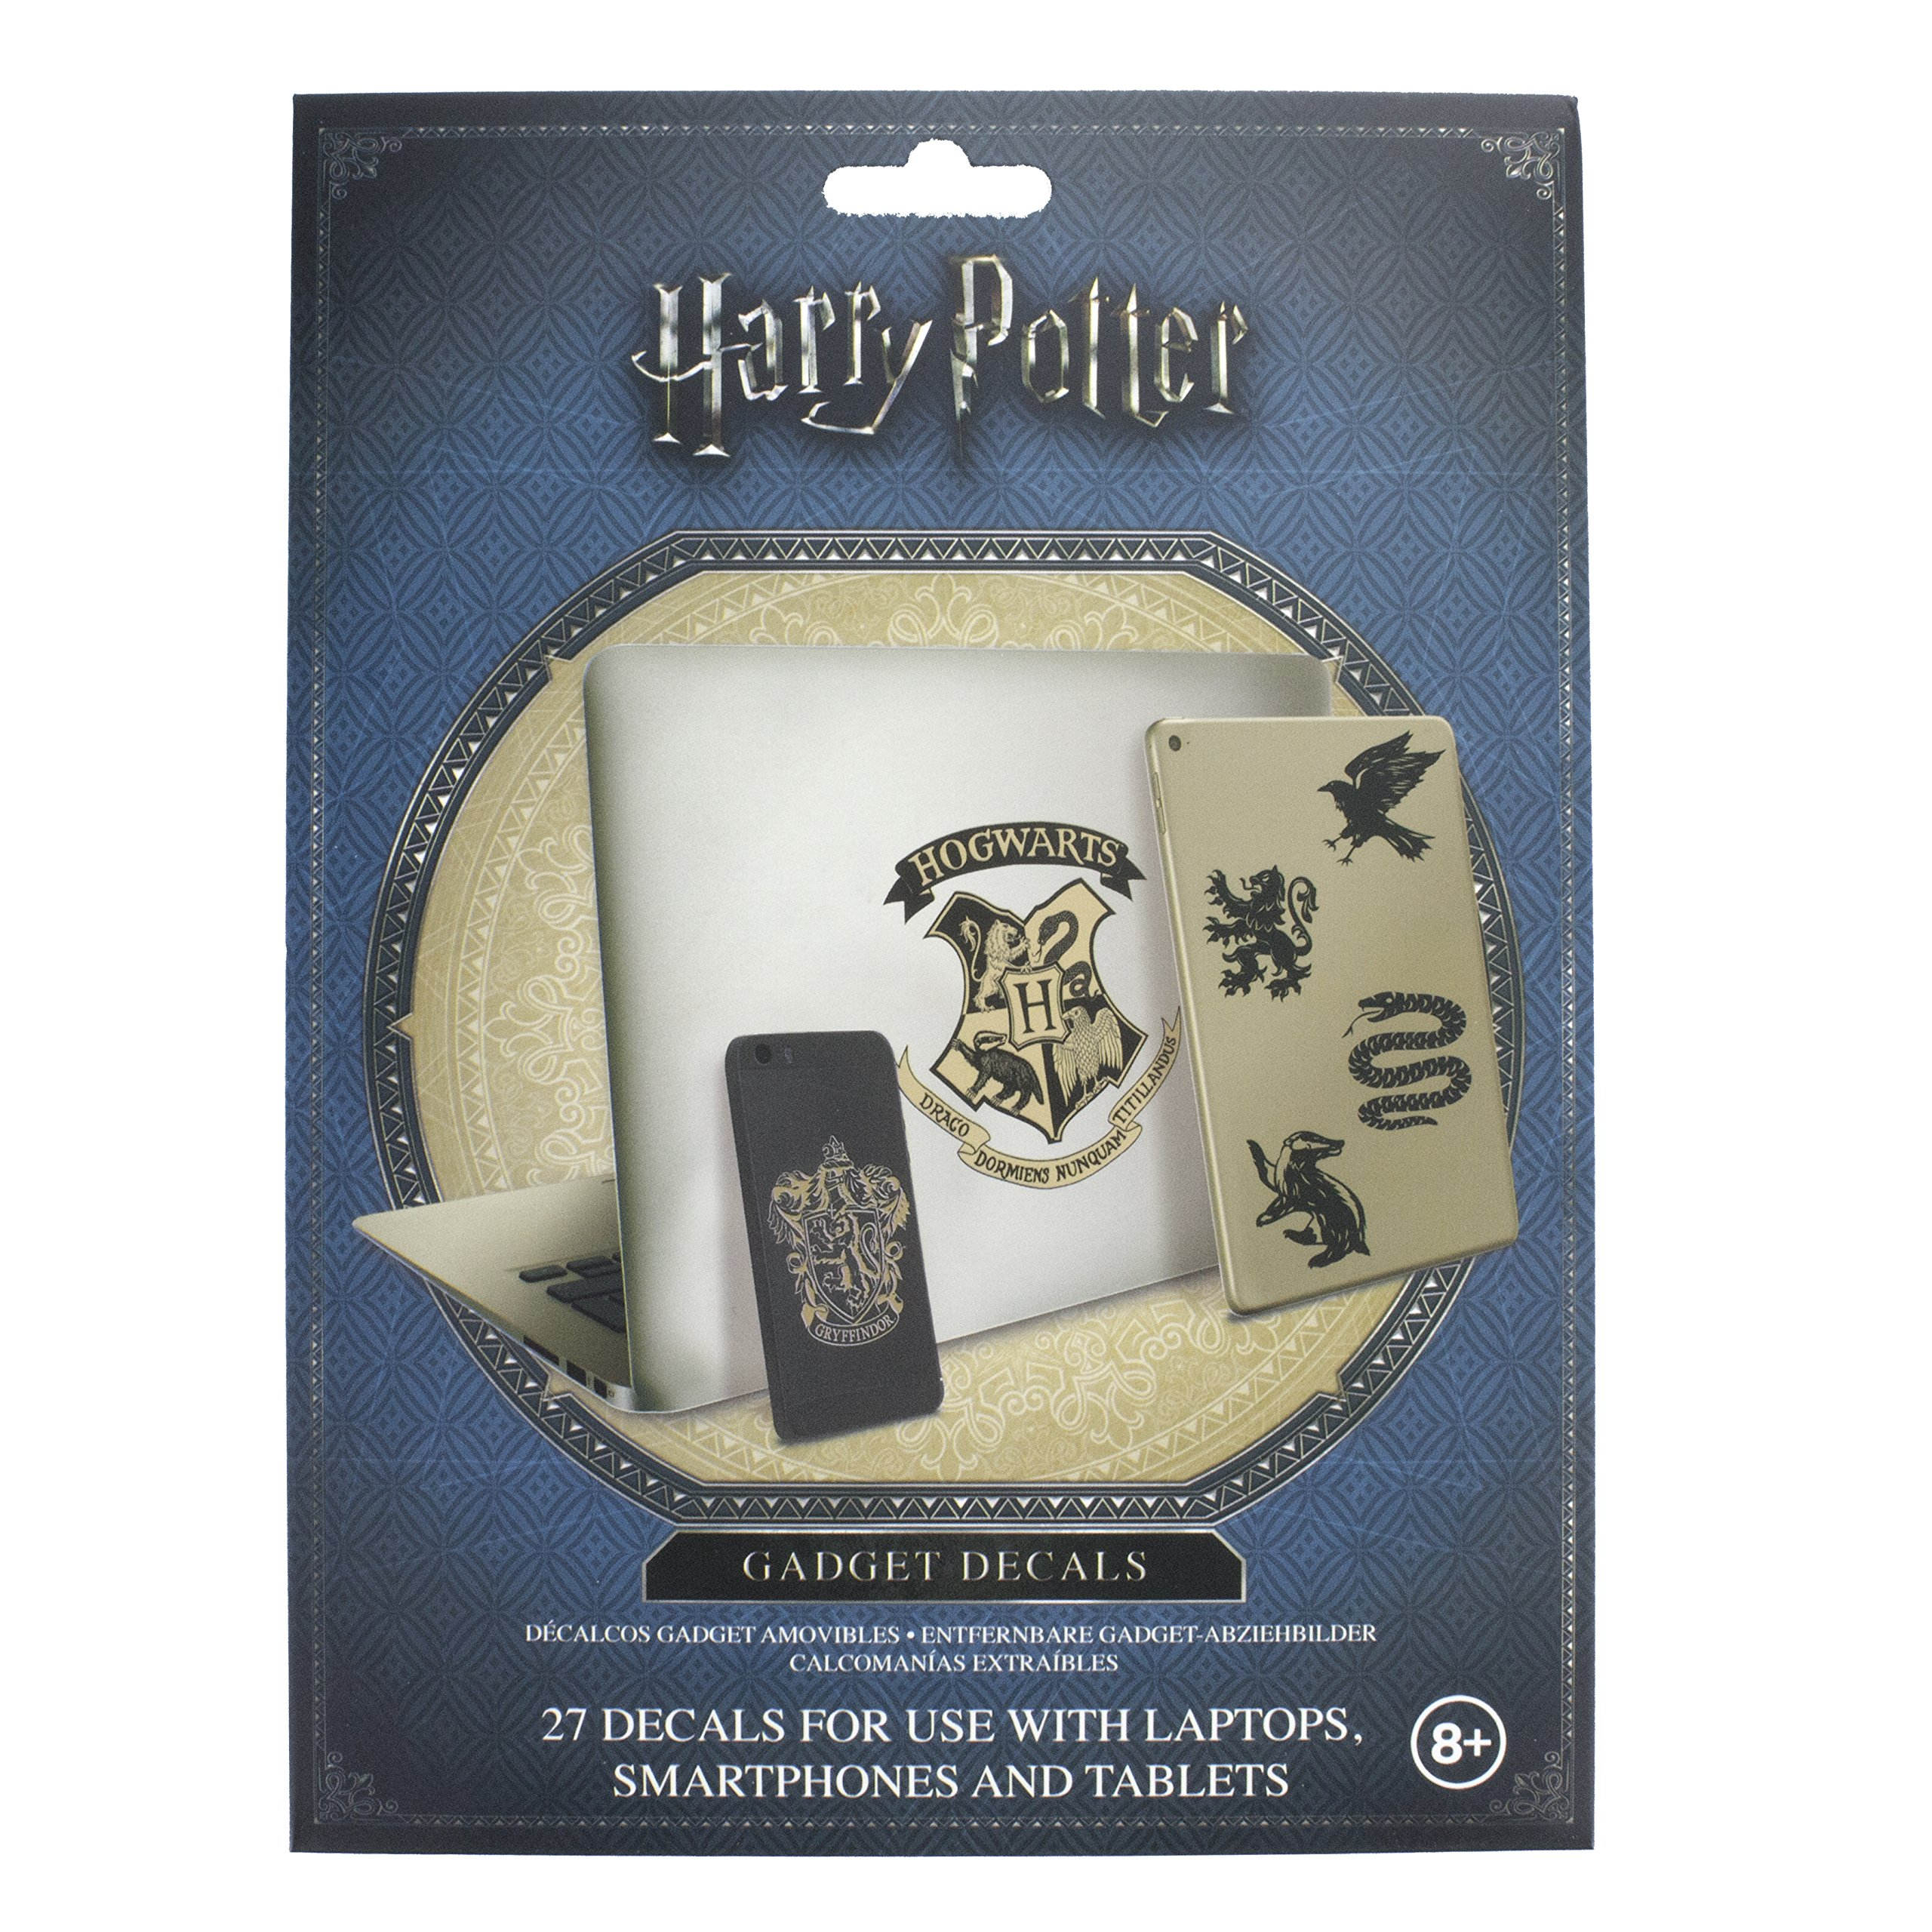 Harry Potter Gadget Decals - Blue Packaging